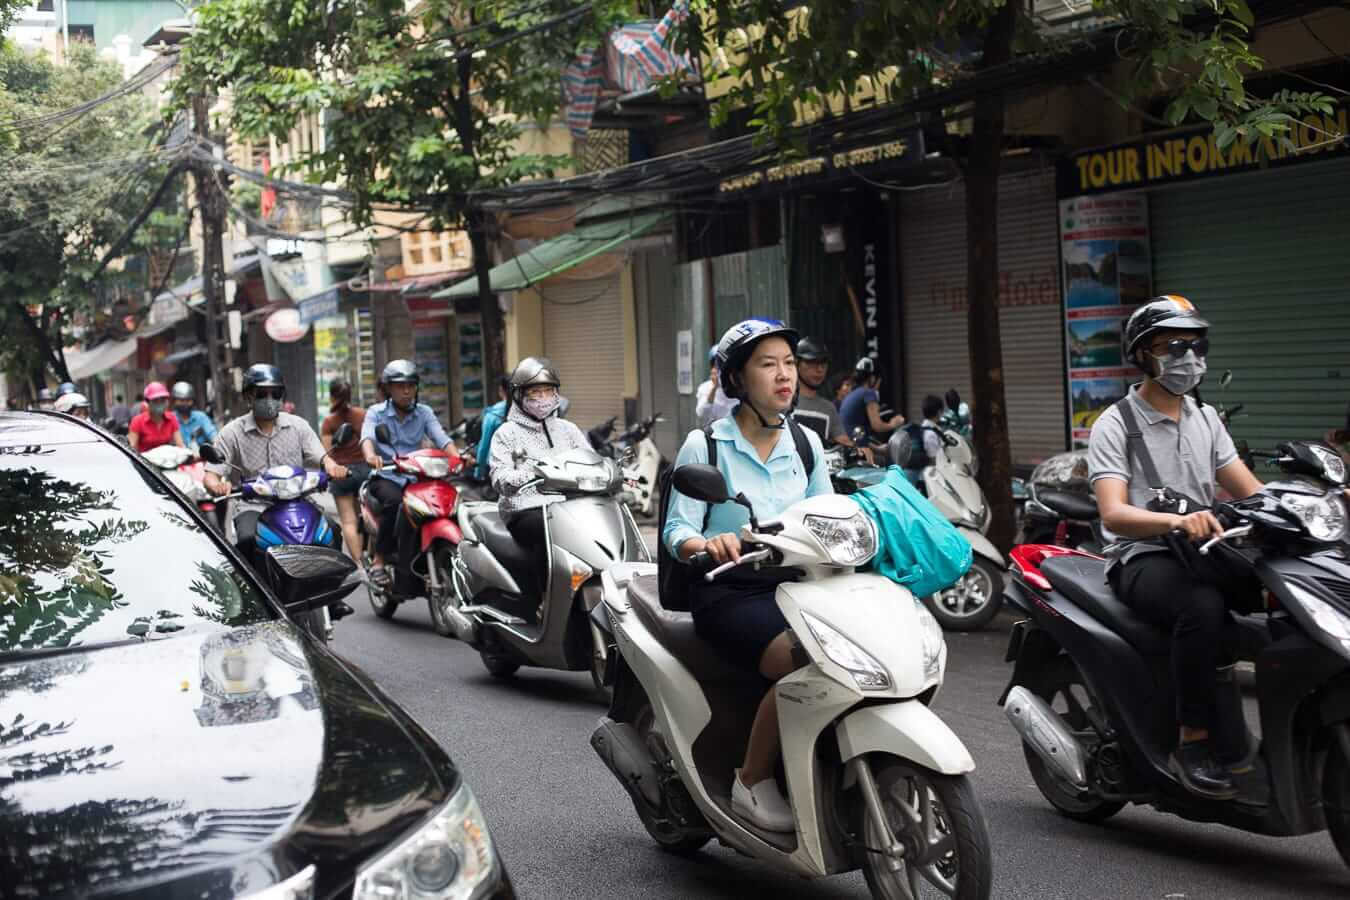 Da Nang International Aiport: Hanoi to Hoi An